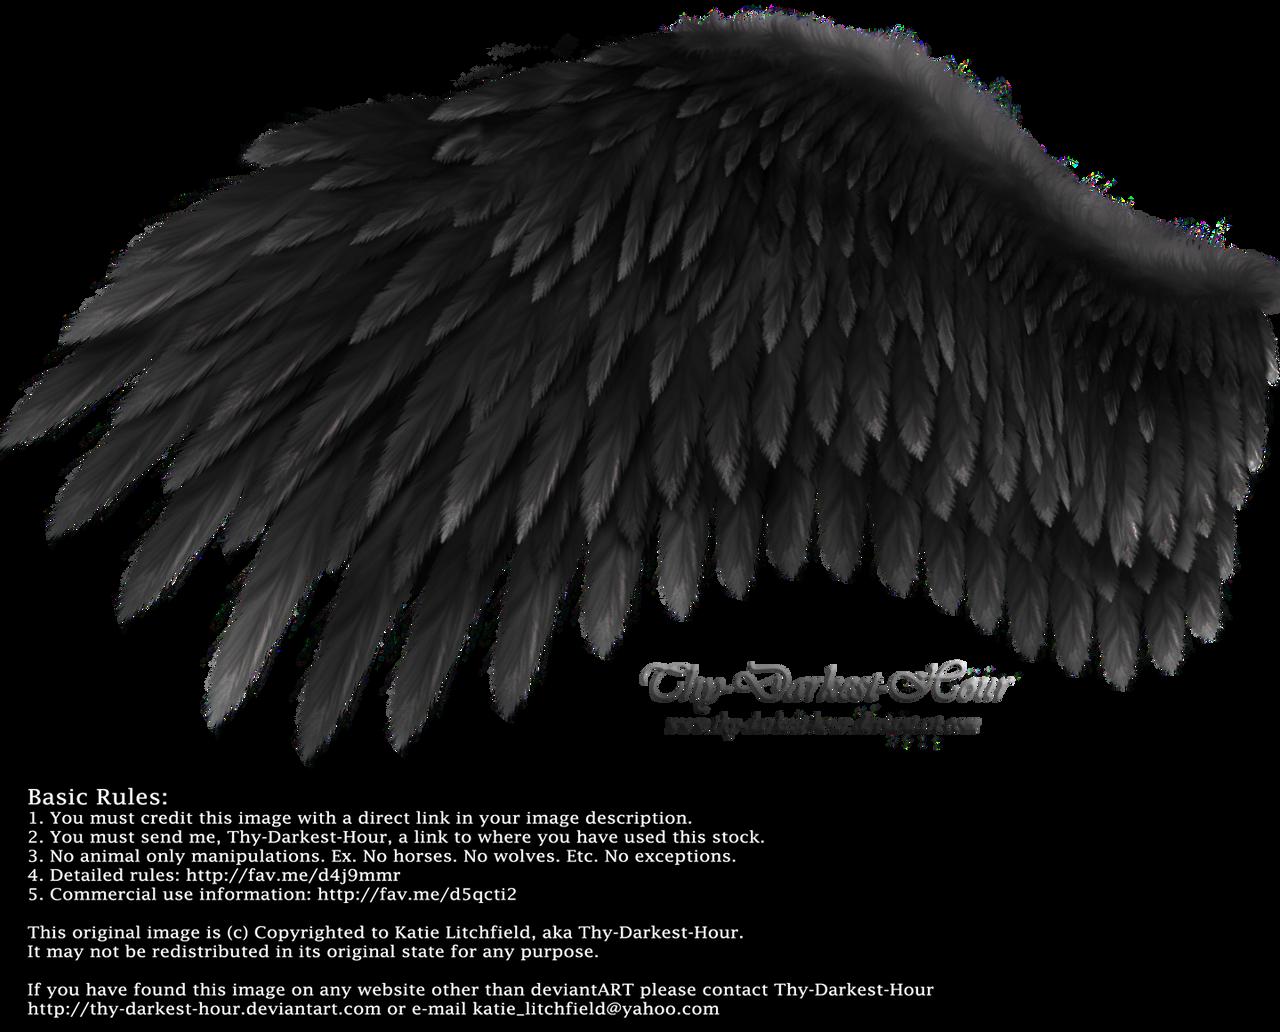 Romantic Wing - Black